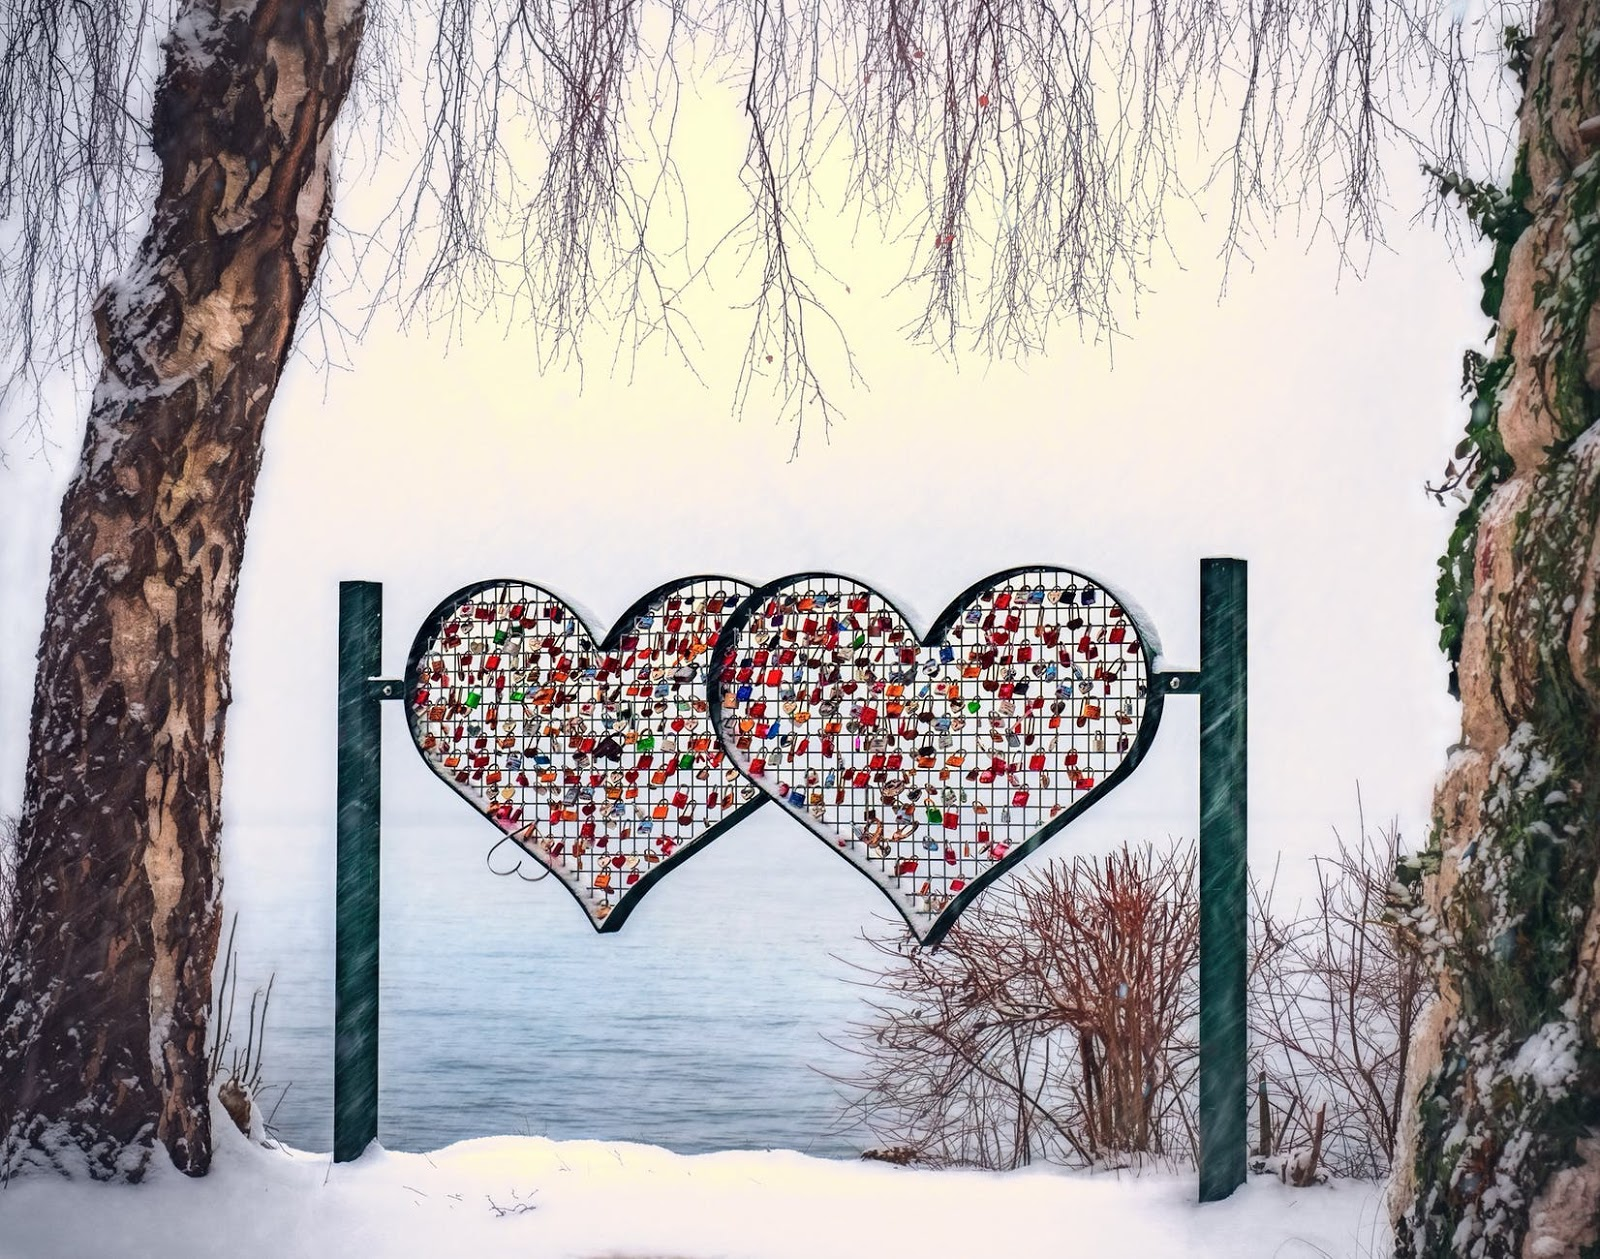 Ucapan Selamat Hari Valentine Bahasa Inggris dan Artinya